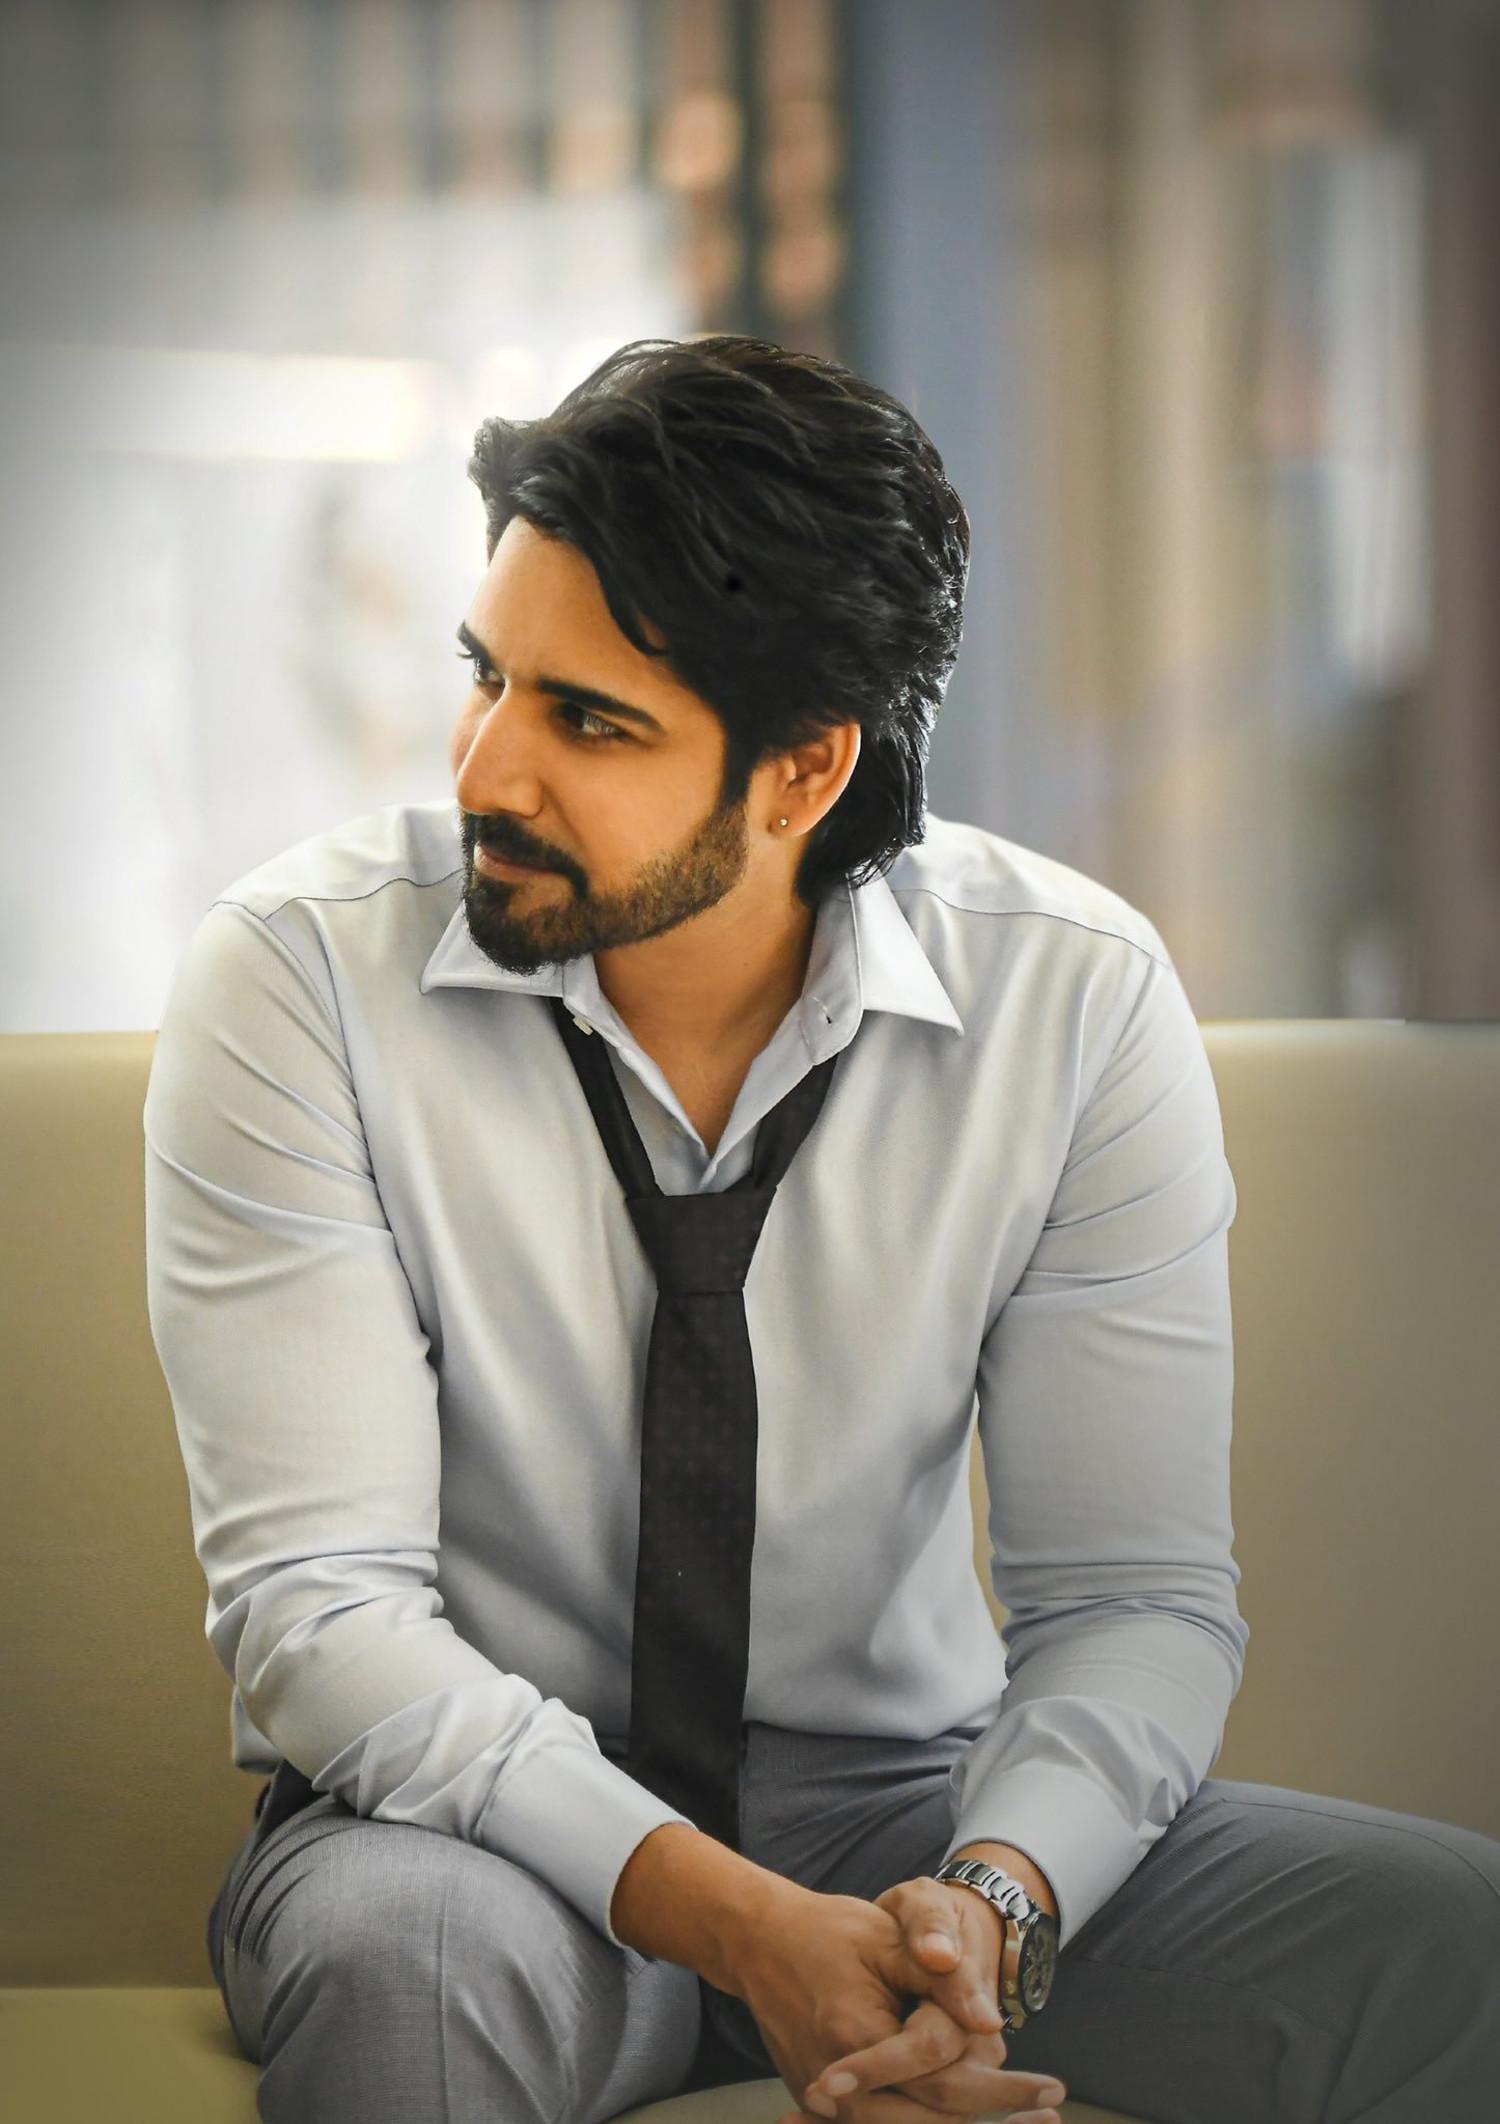 Actor Sushanth in Ala Vaikuntha Puram Lo Movie HD Images